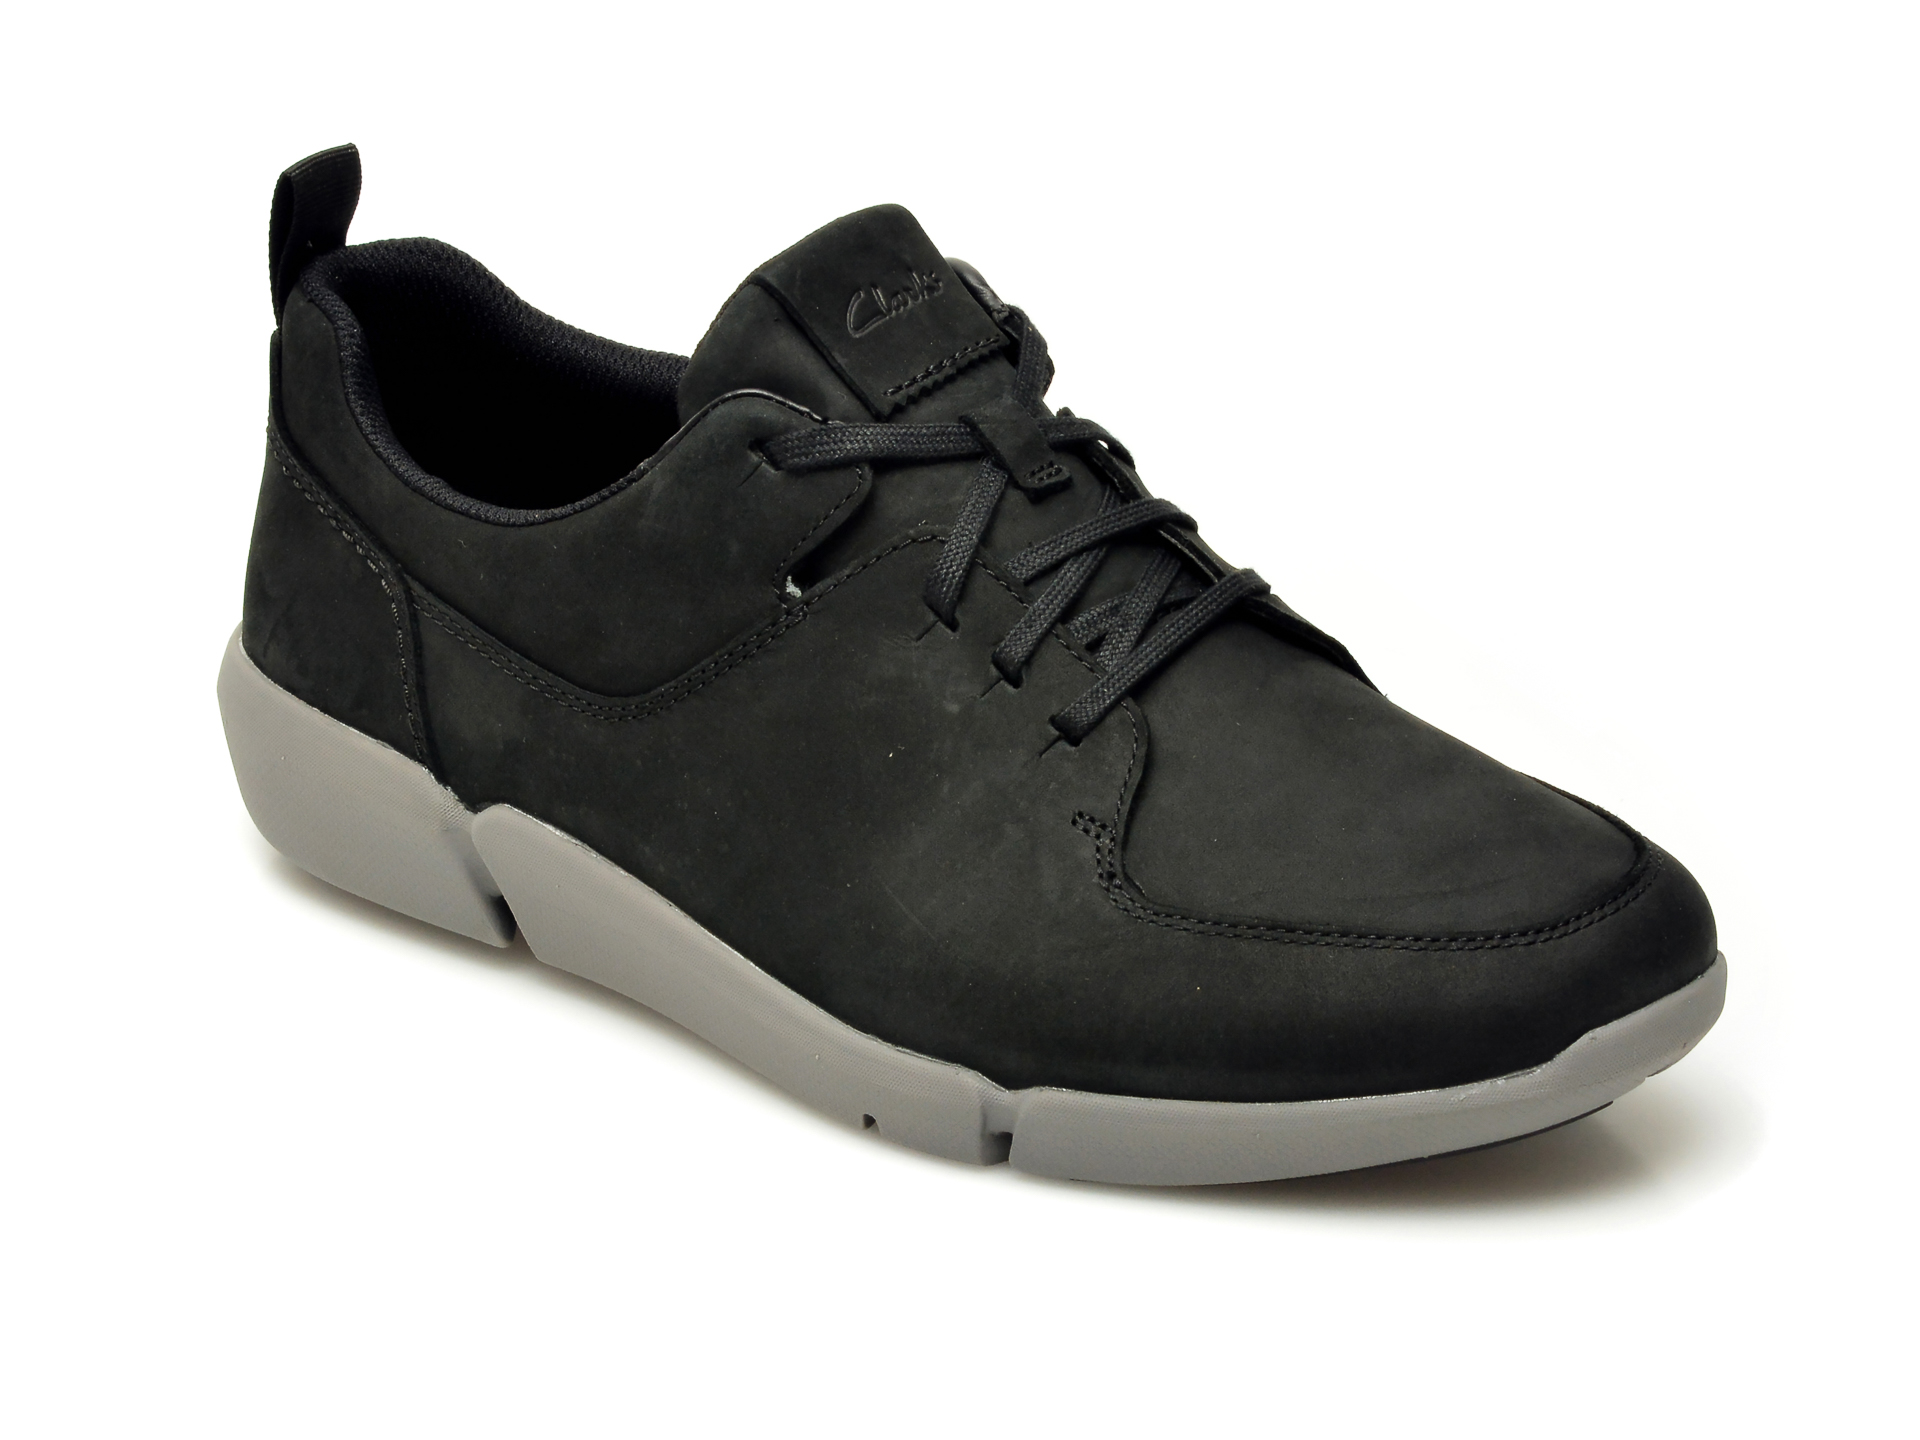 Pantofi CLARKS negri, HERO AIR LACE, din nabuc